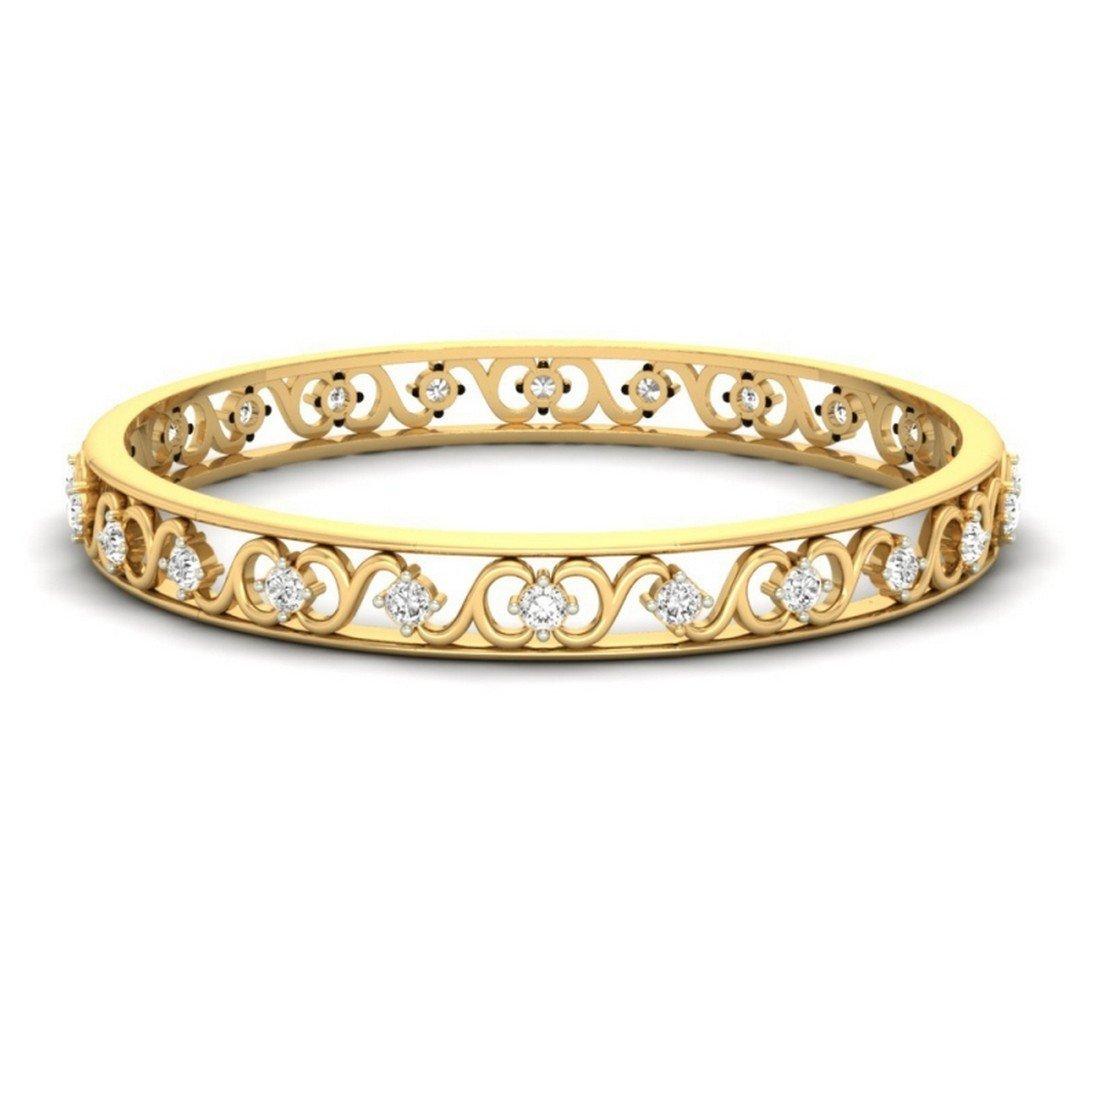 2 cttw Round-Cut-Diamond 7 inches 14K Yellow Gold IJ  SI HallMarked bangle-bracelets Size